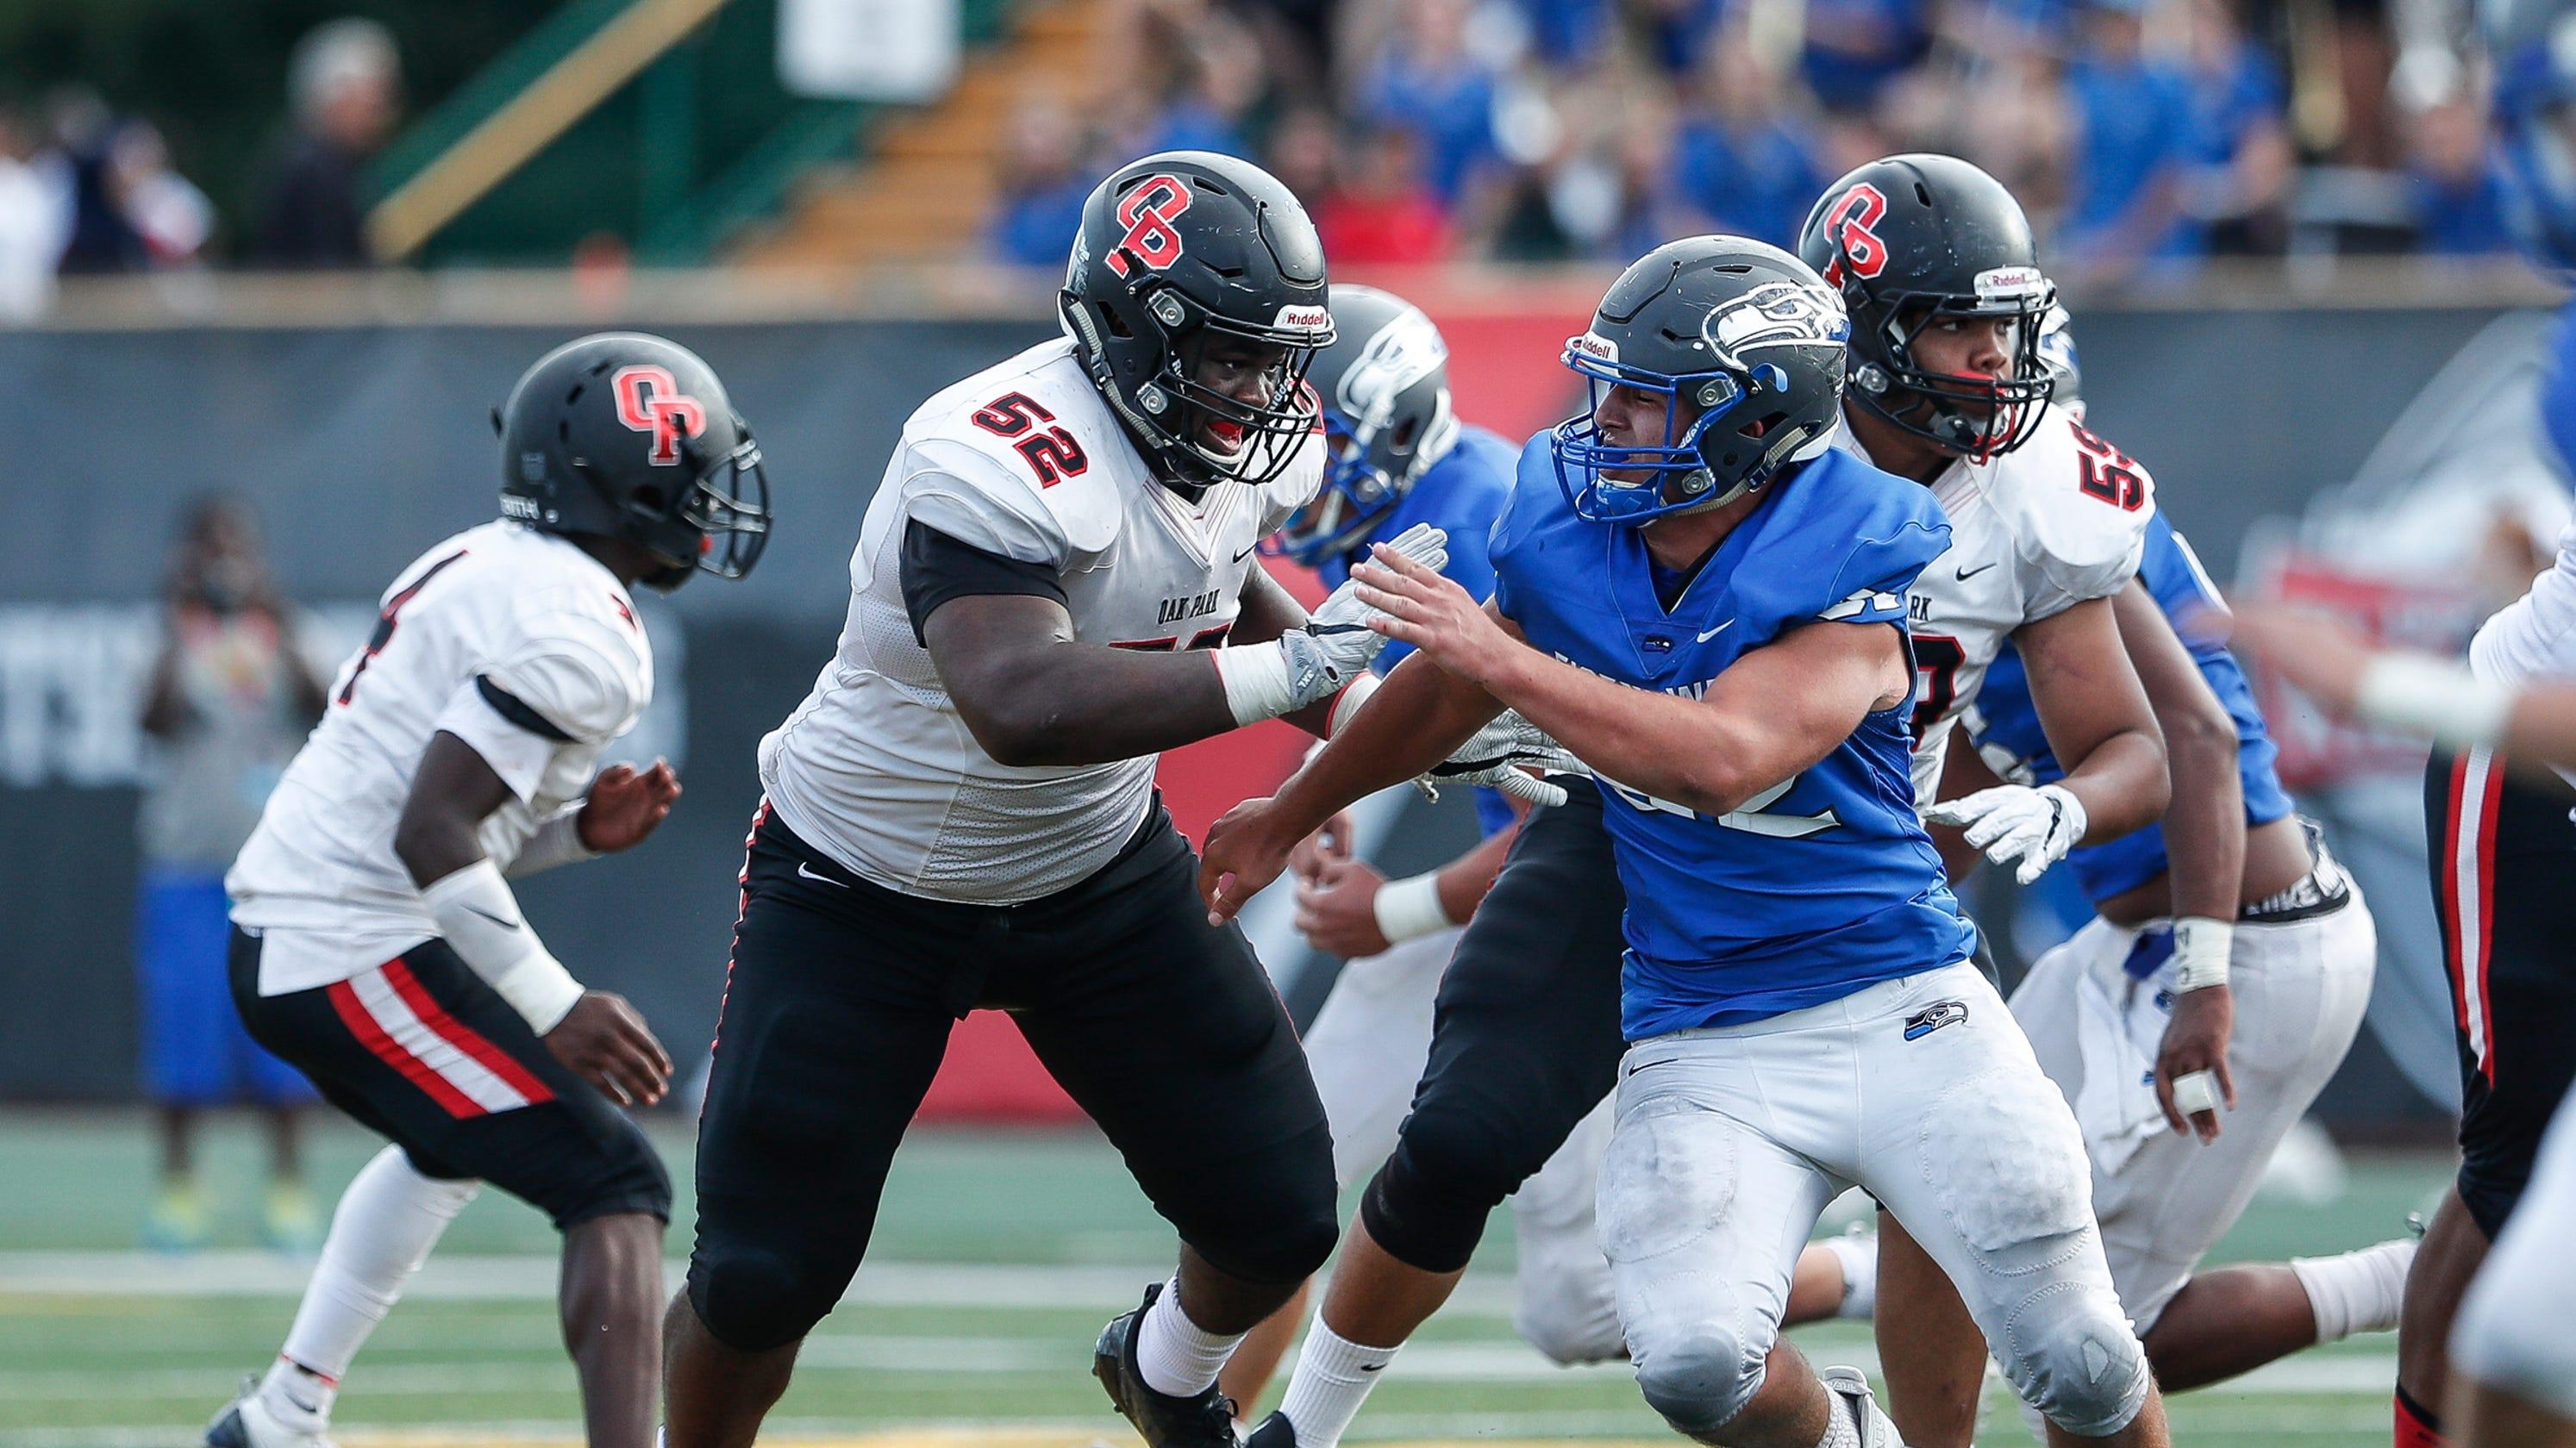 Top Linebacker Recruits 2020.Michigan Football Recruiting 2020 Jim Harbaugh S Top Targets